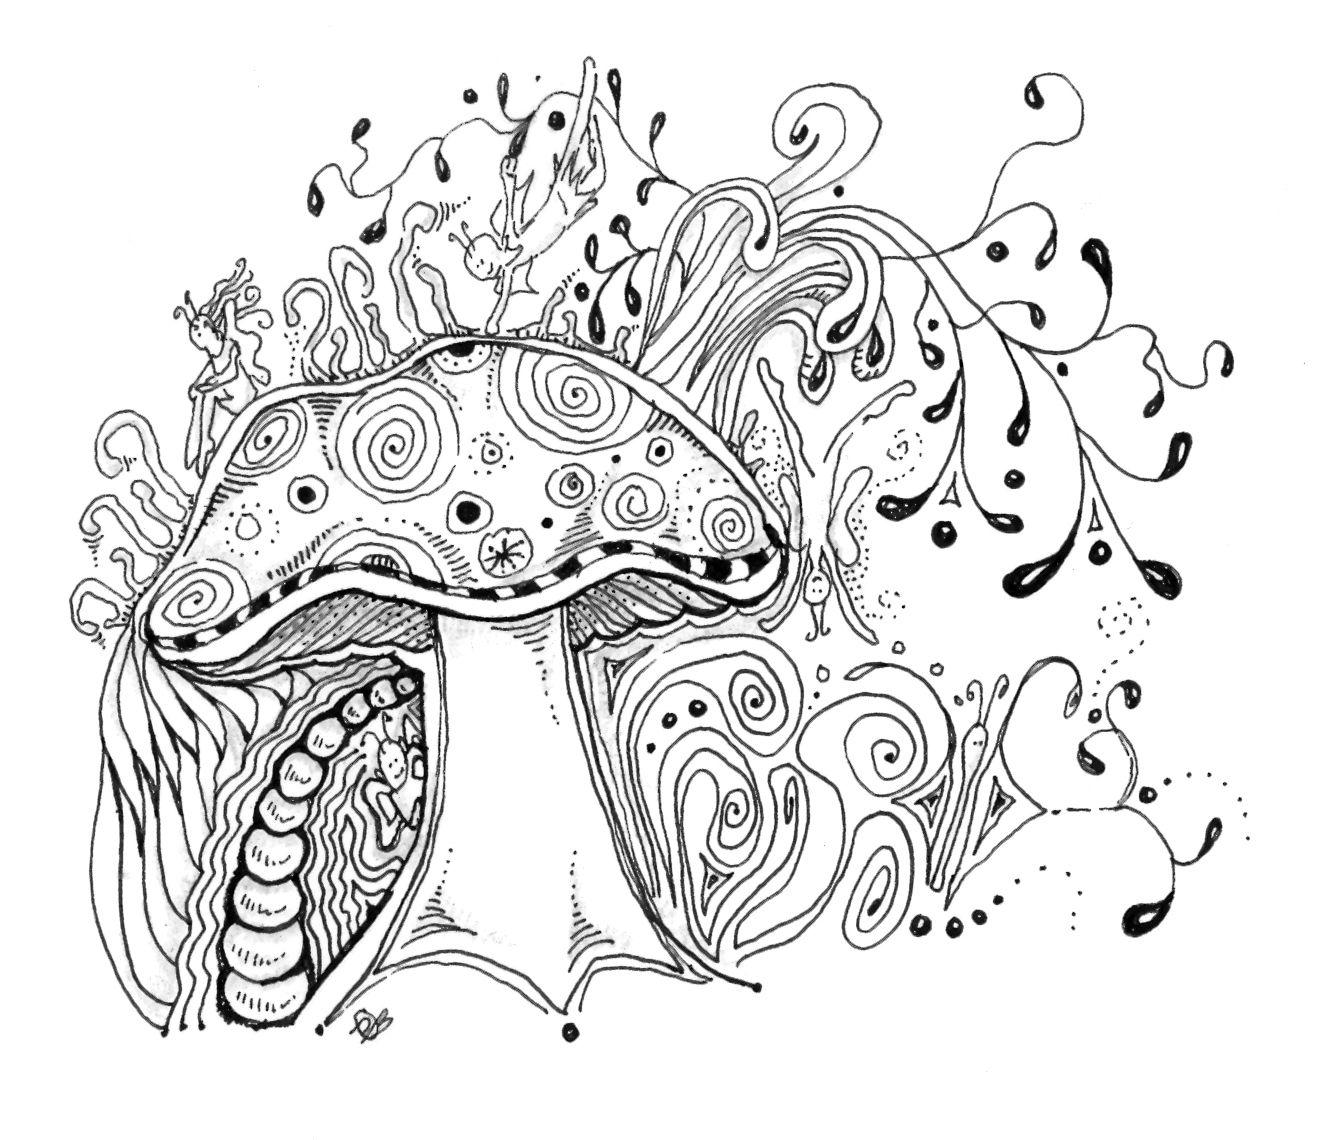 fairy zentangle birthday art - Google Search   Birthdays   Pinterest ...